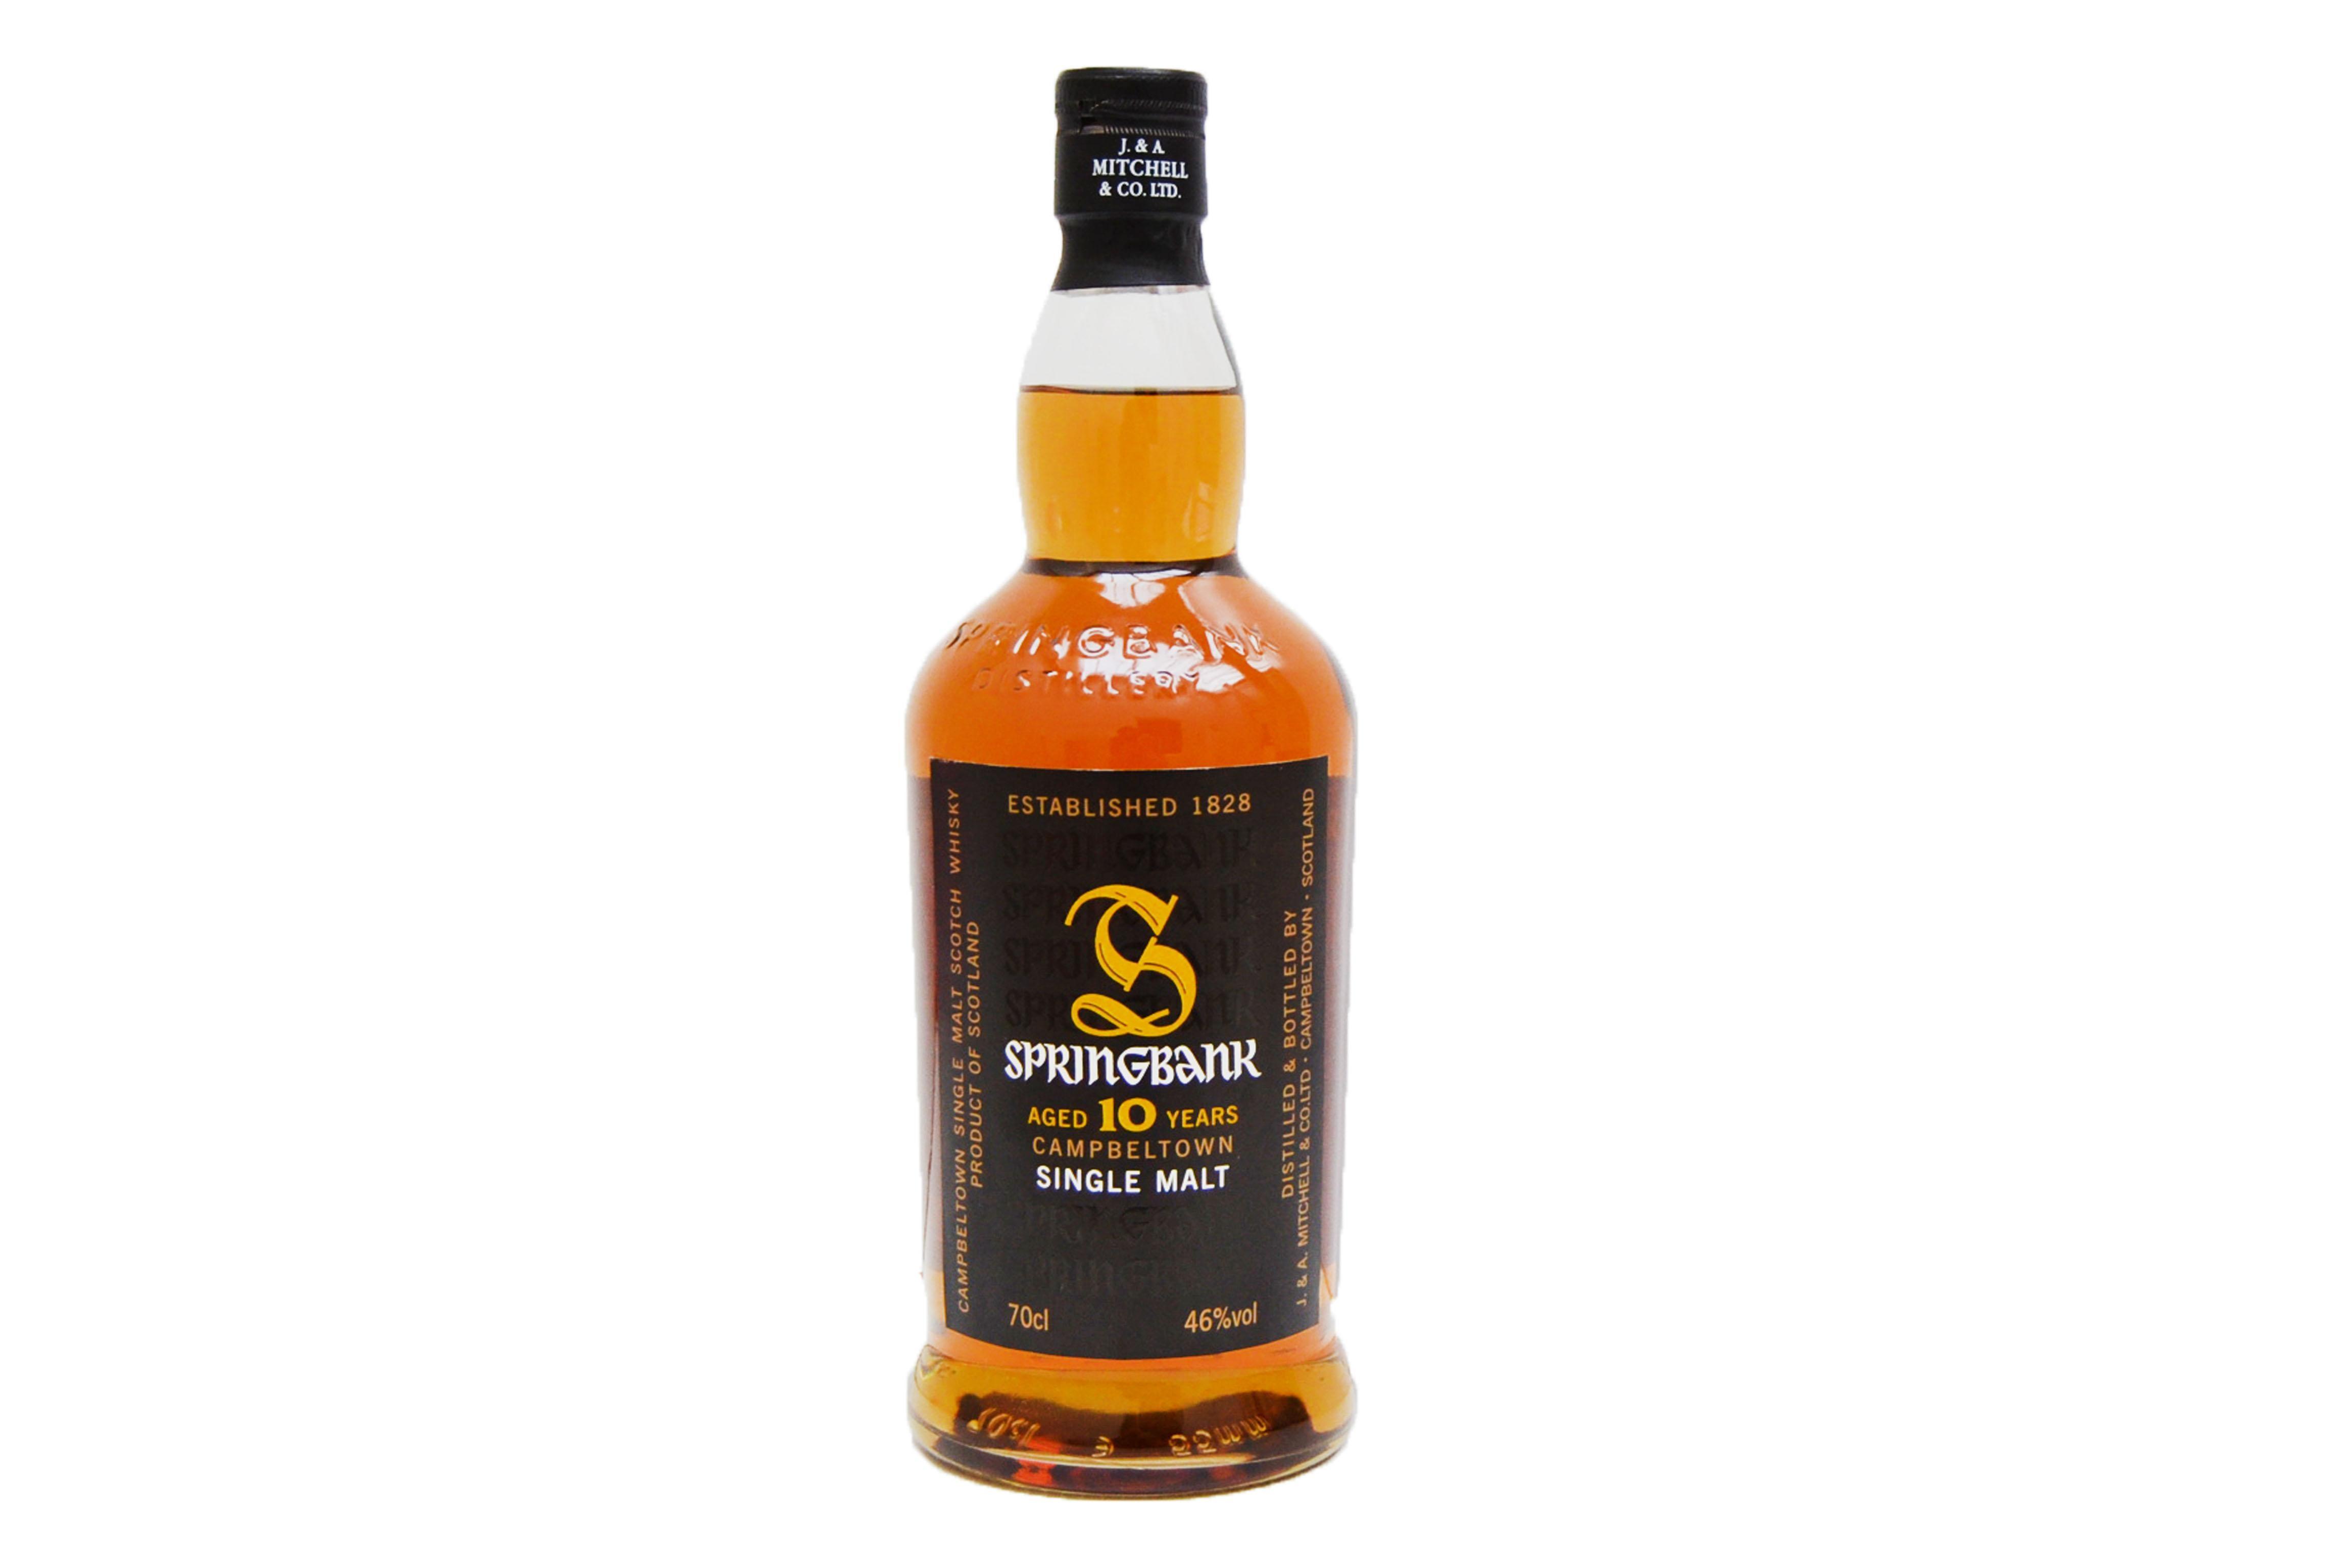 Springbank 10 Ans d'Age 70cl 46% Campbeltown Single Malt Whisky Ecosse